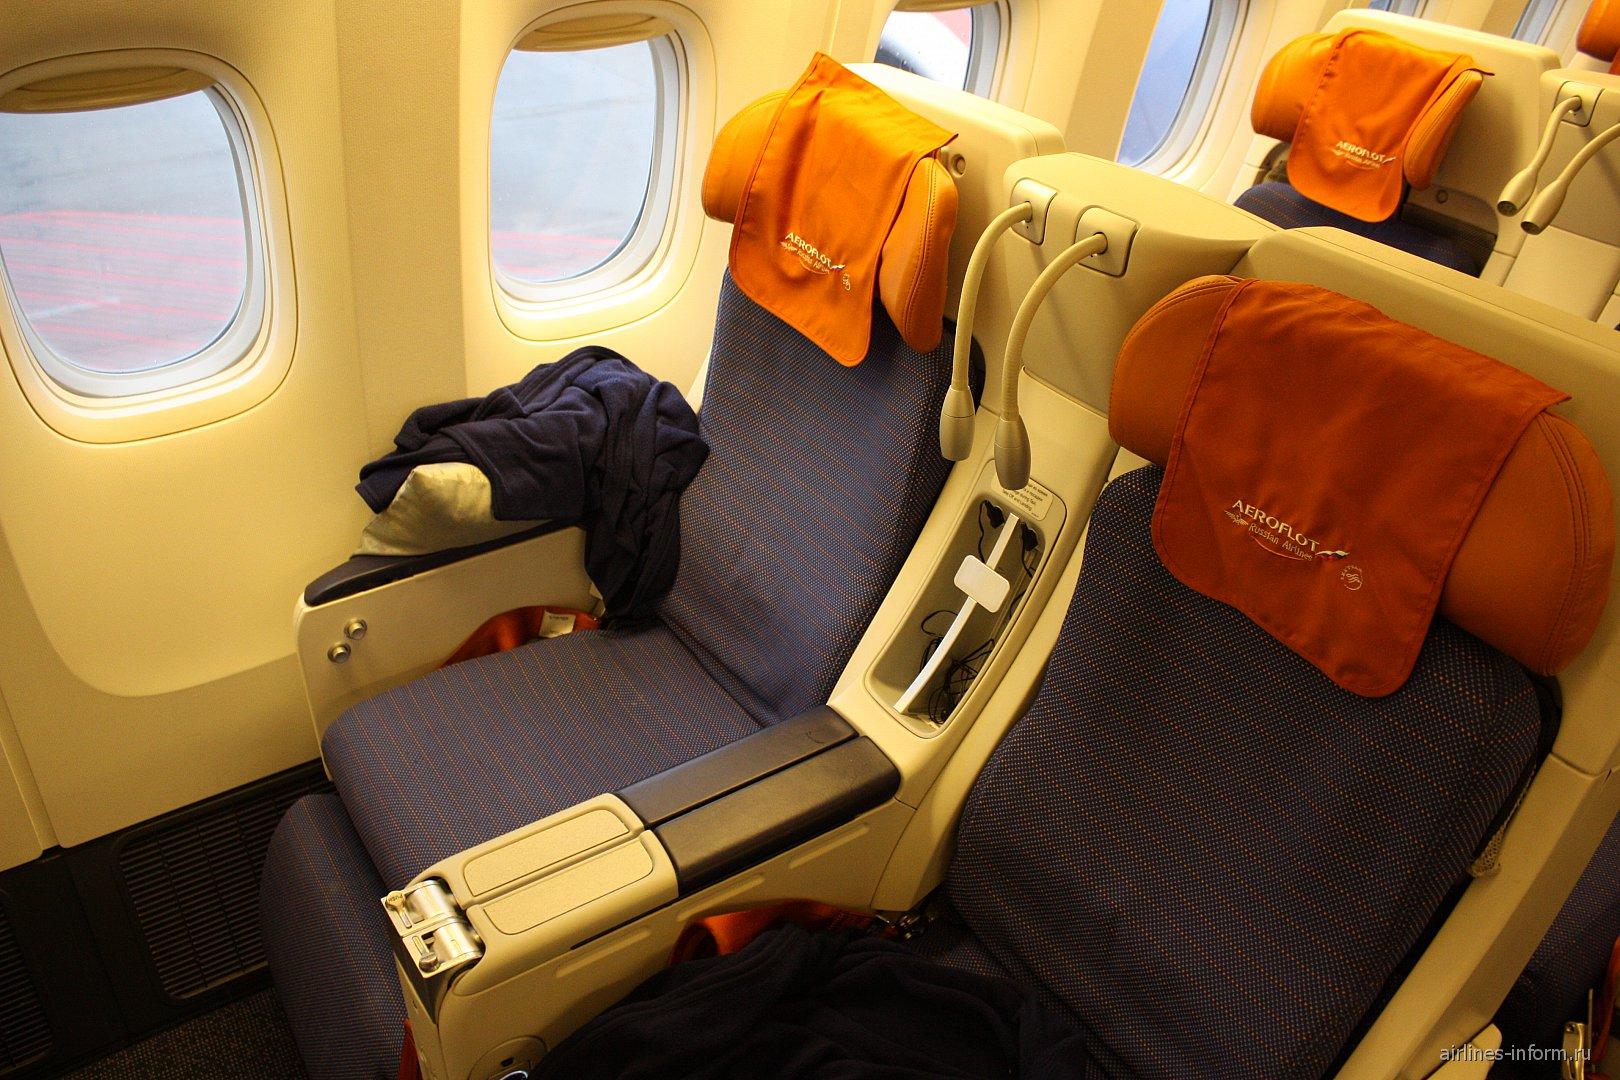 Кресла комфорт-класса в самолете Боинг-777-300 Аэрофлота